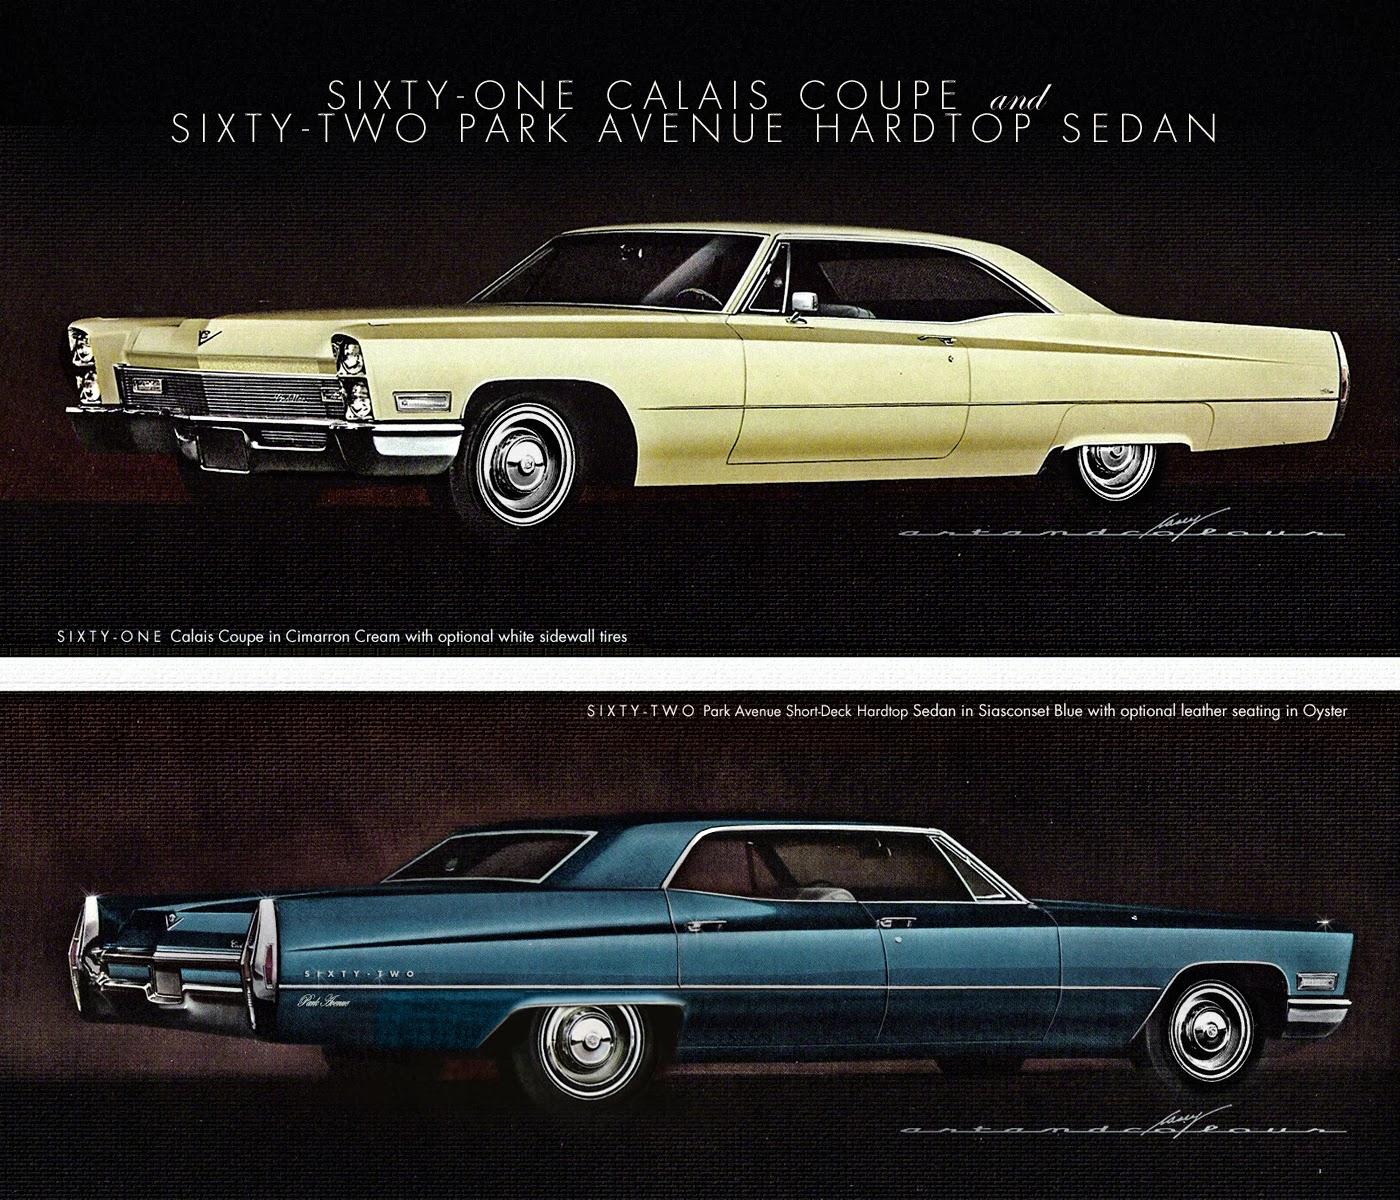 Casey/artandcolour/cars: 1968 Cadillac Lineup Grows By Ten